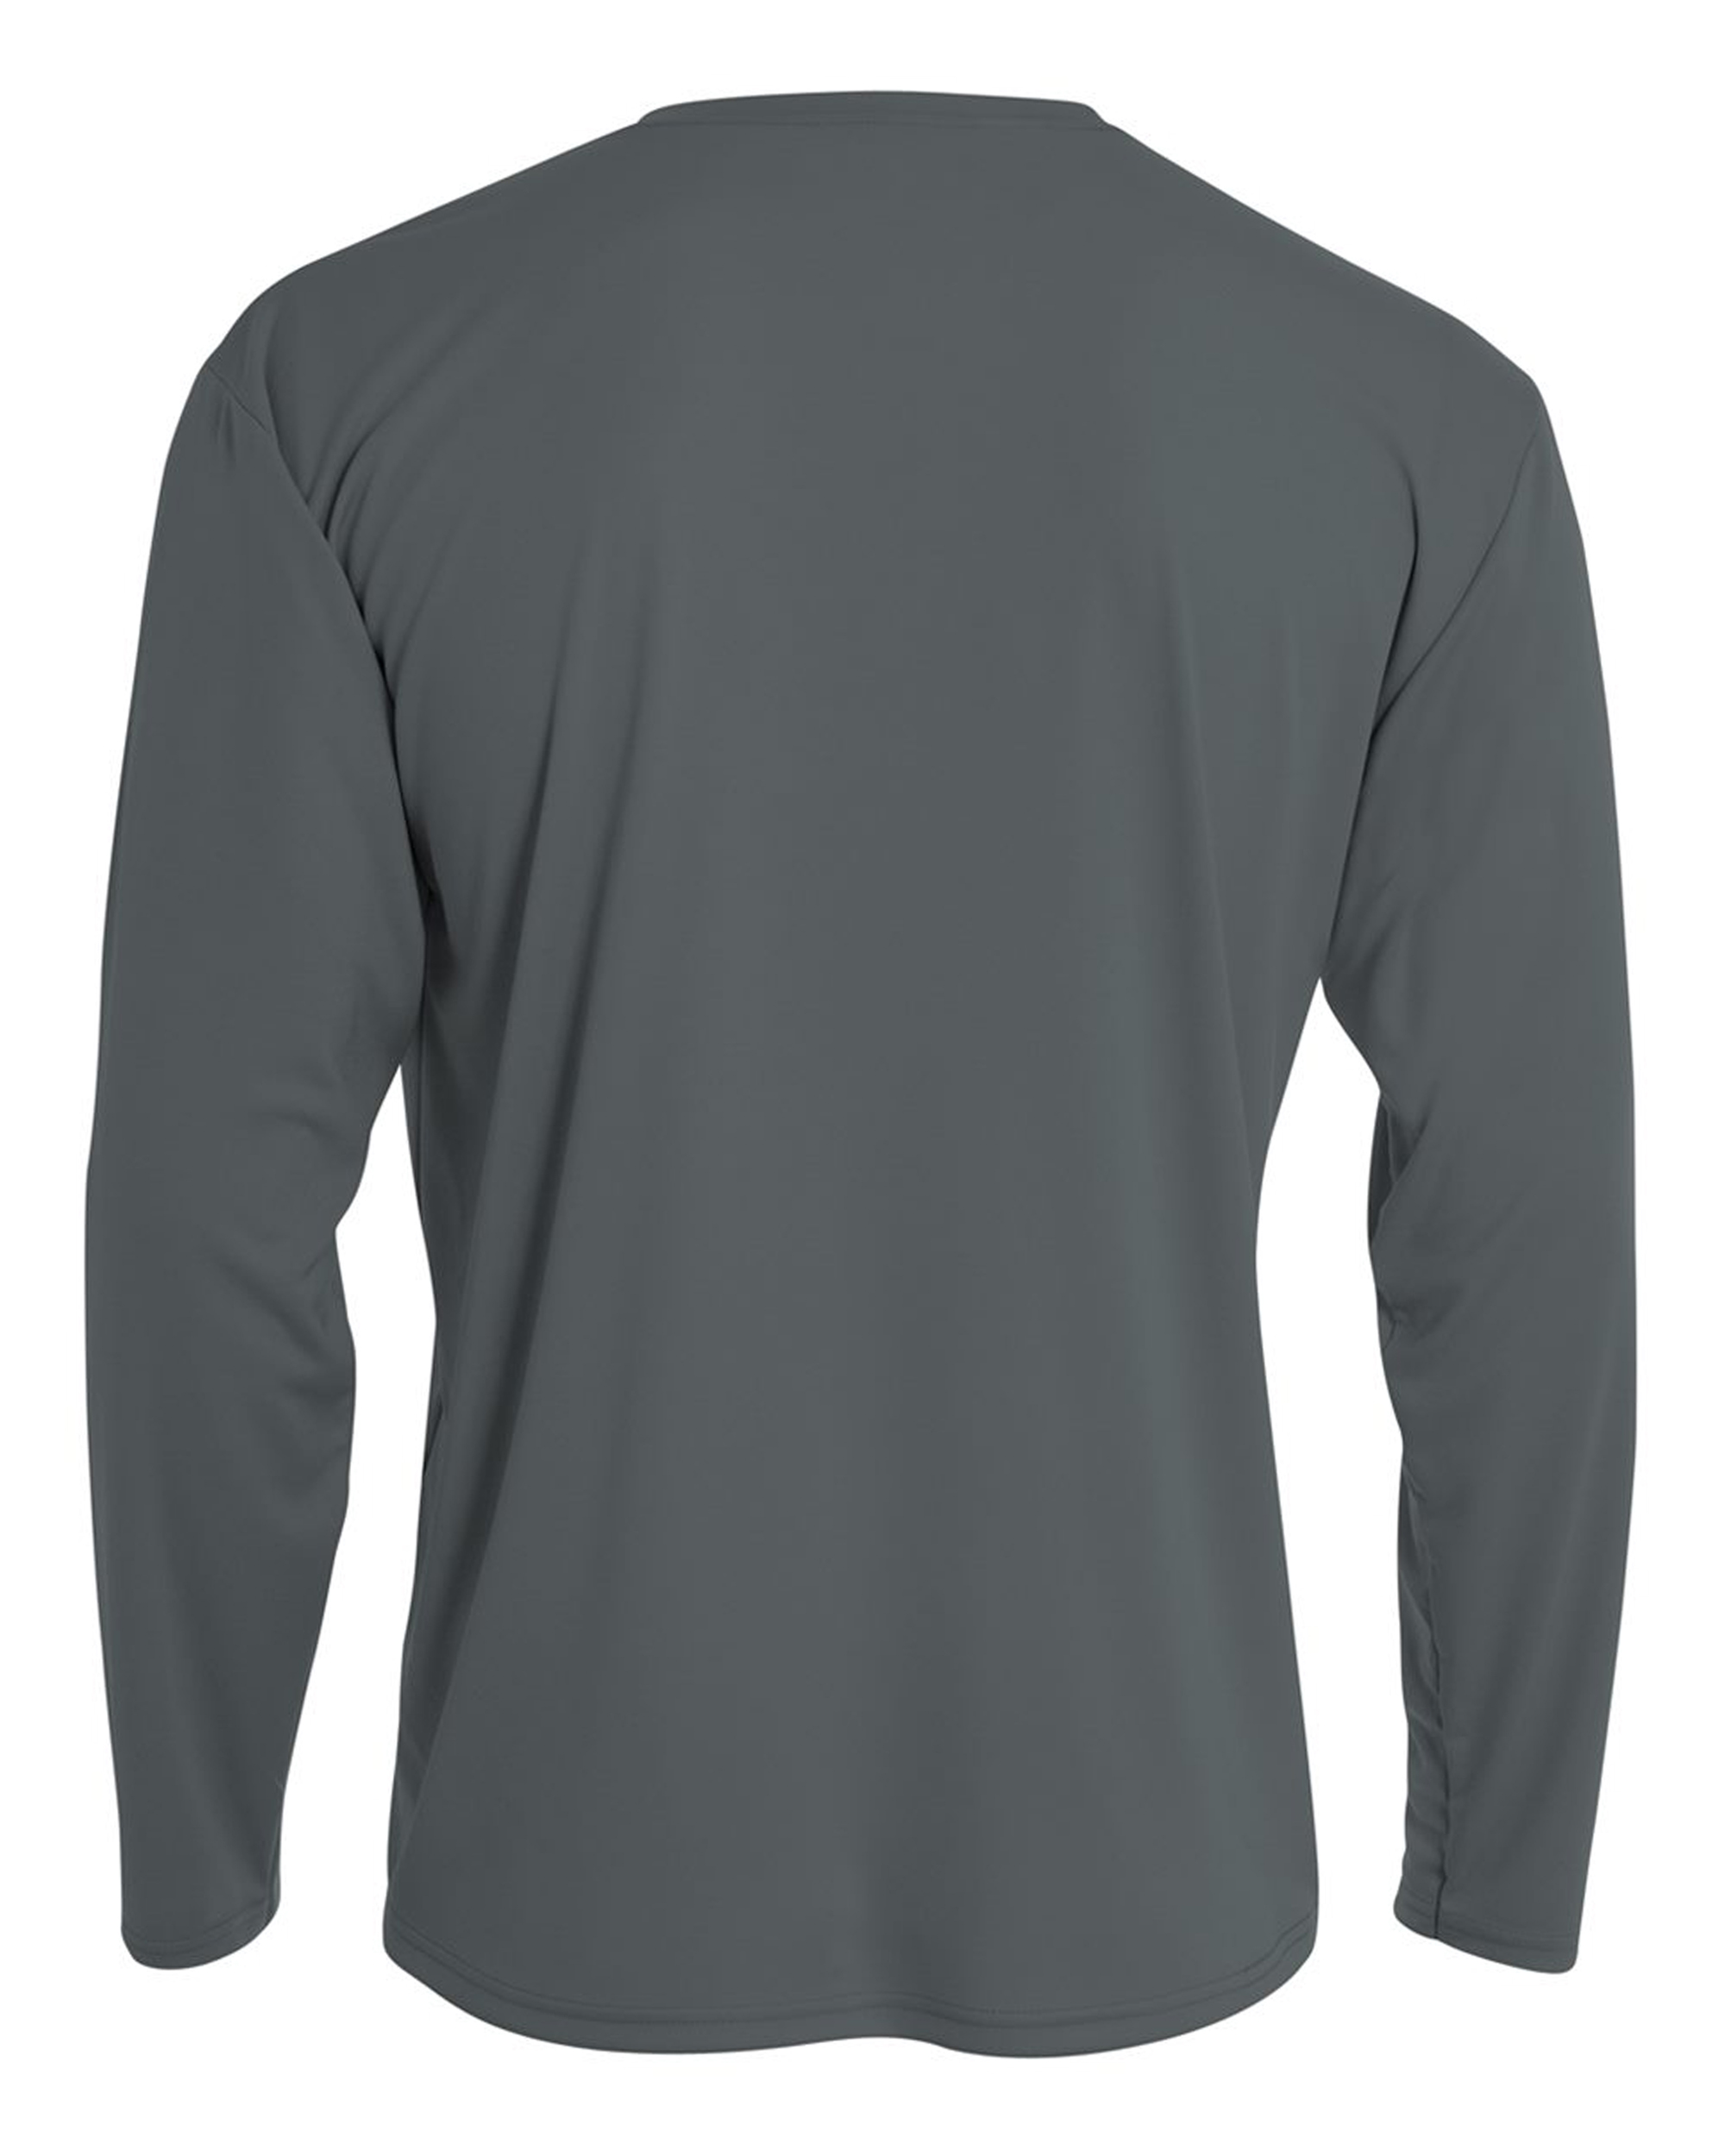 Men-039-s-Long-Sleeve-Loose-Fit-Rash-Guard-Surf-Shirt-Water-Sports-Swimwear thumbnail 12